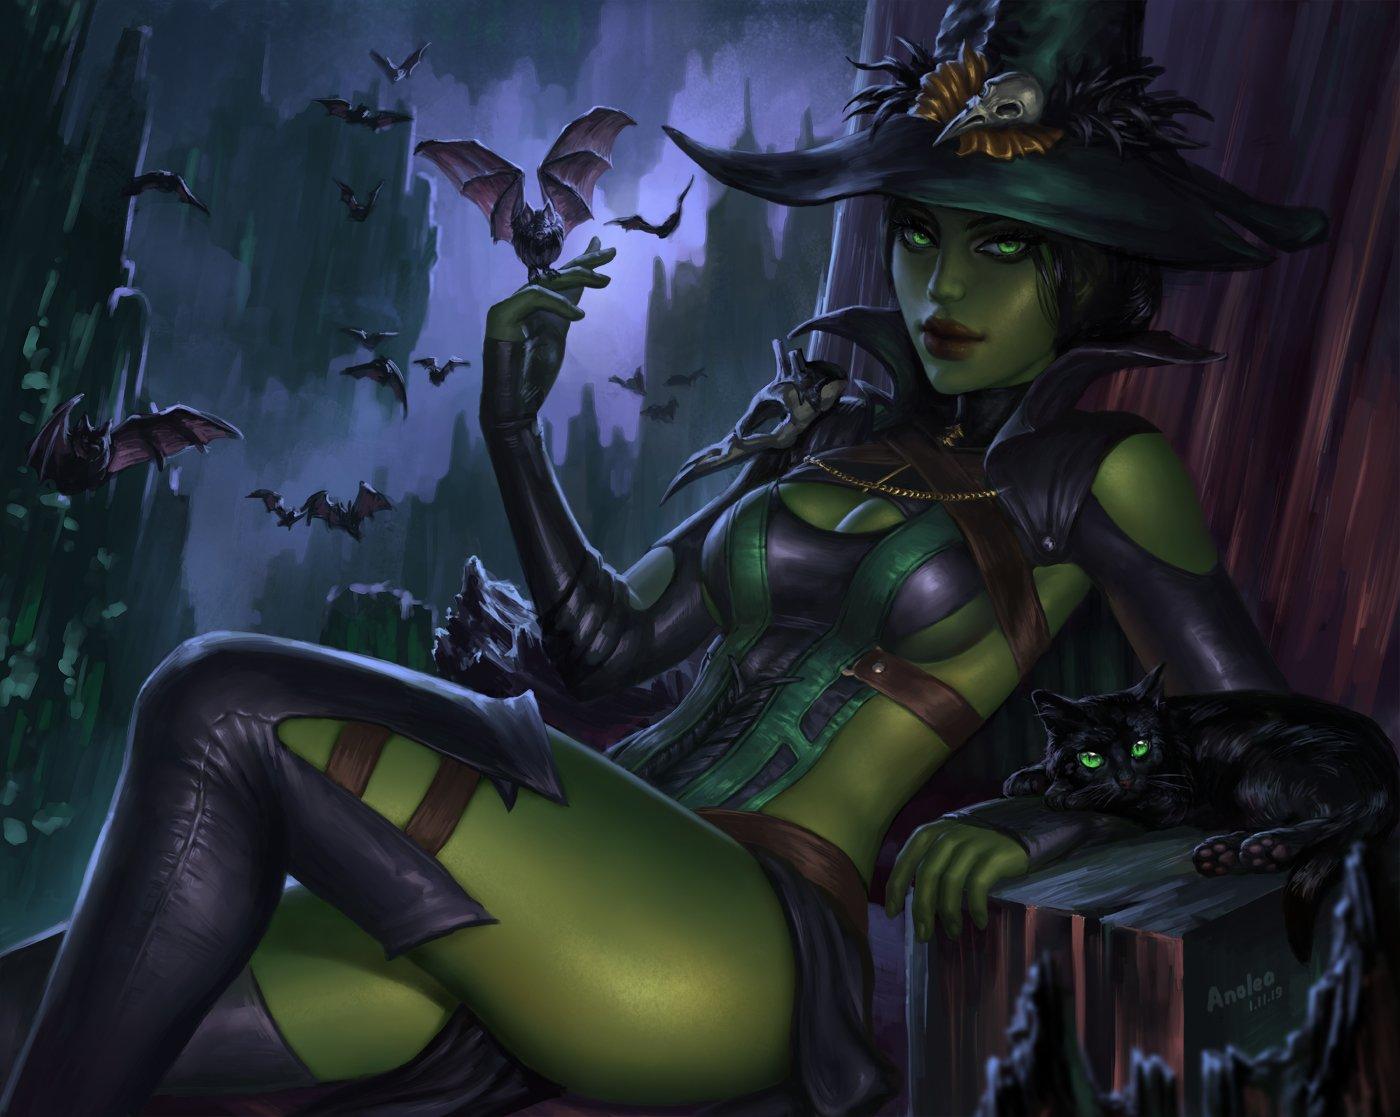 Anolea 18 On Twitter Wicked Witch Jade From Mortal Kombat 11